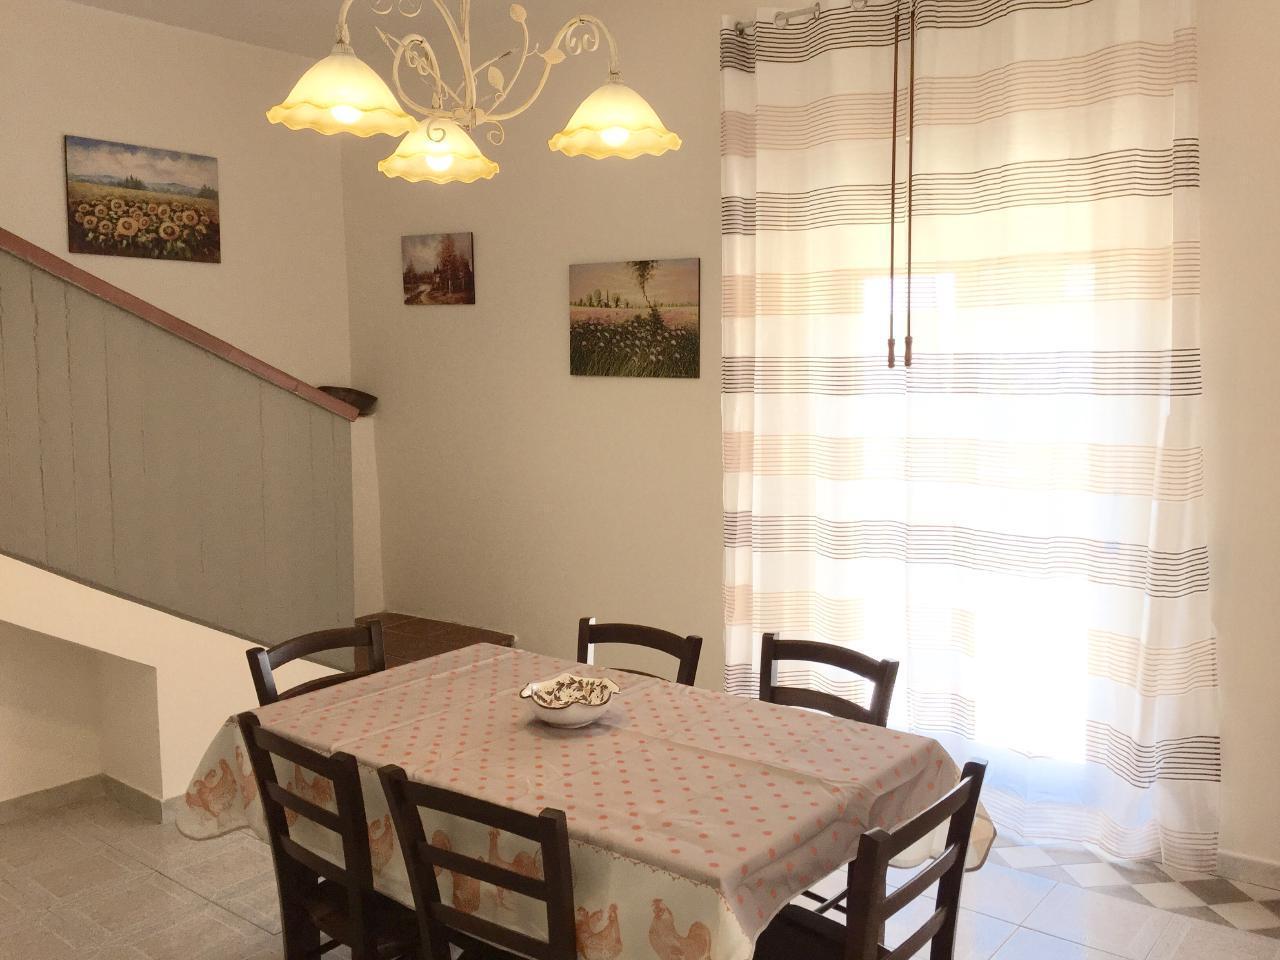 Maison de vacances Etna Dimora dei Saponari (2170785), Trecastagni, Catania, Sicile, Italie, image 7